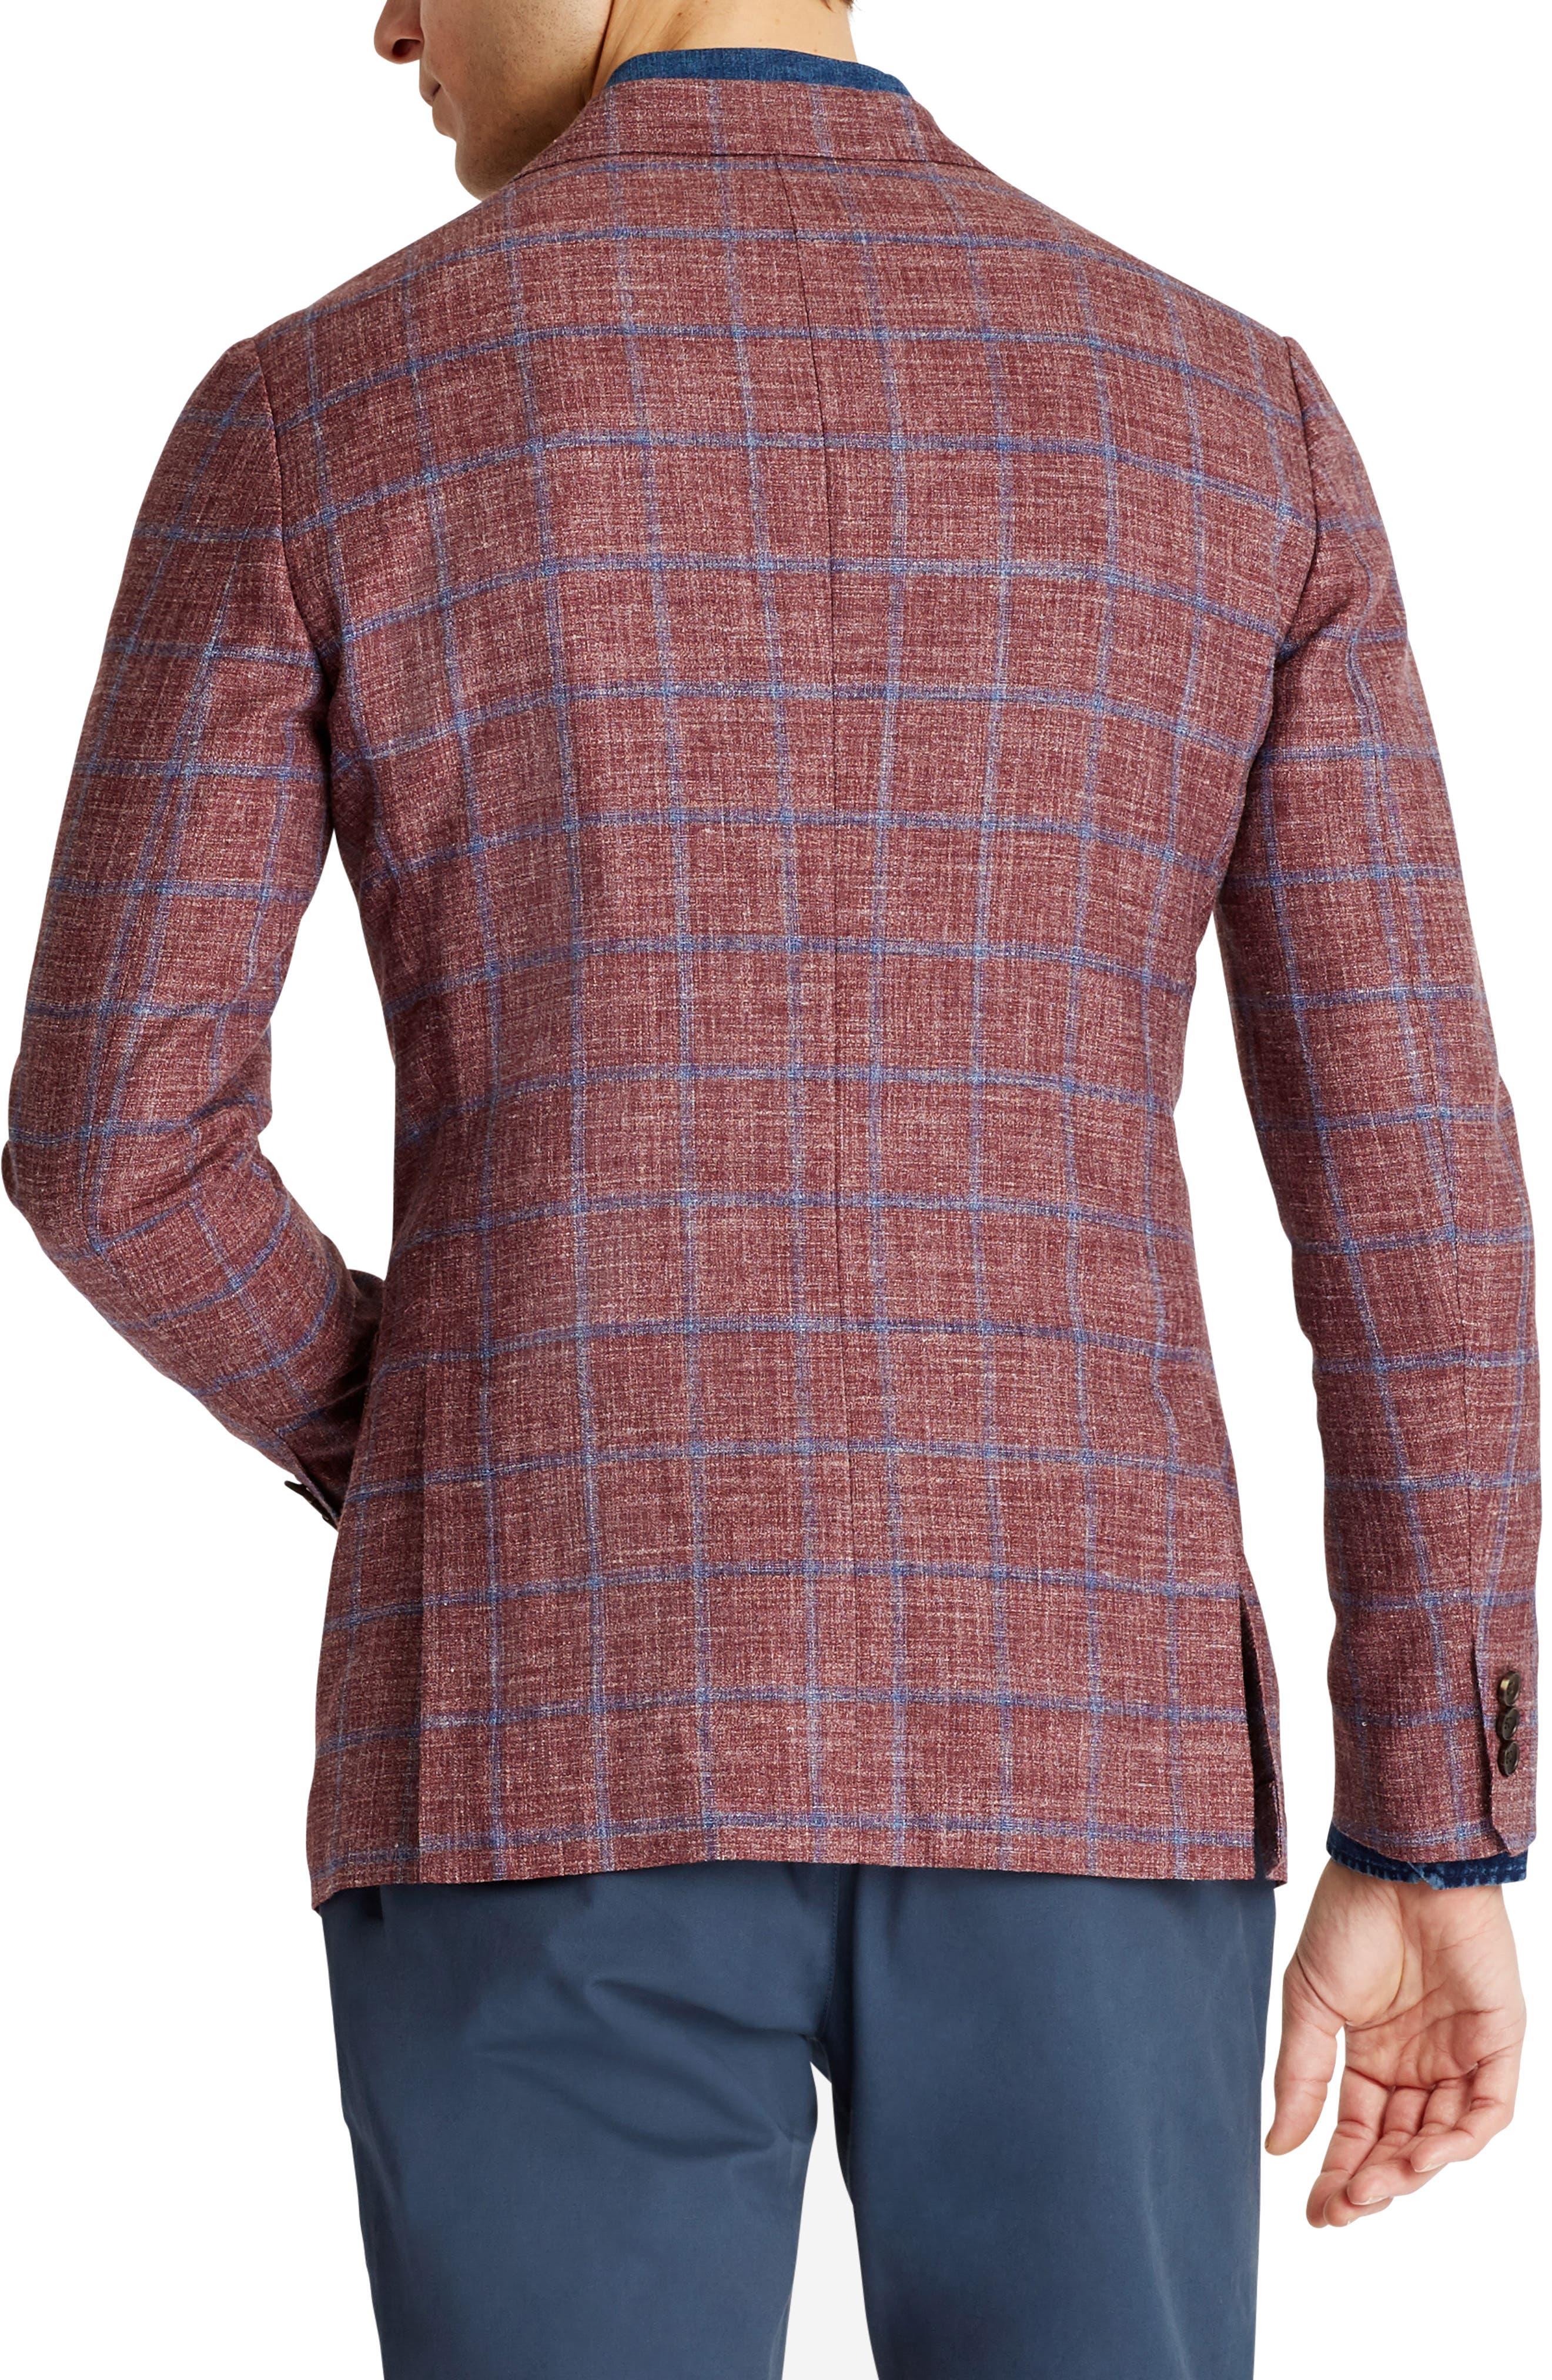 Capstone Slim Fit Windowpane Wool Blend Sport Coat,                             Alternate thumbnail 2, color,                             Red Plaid